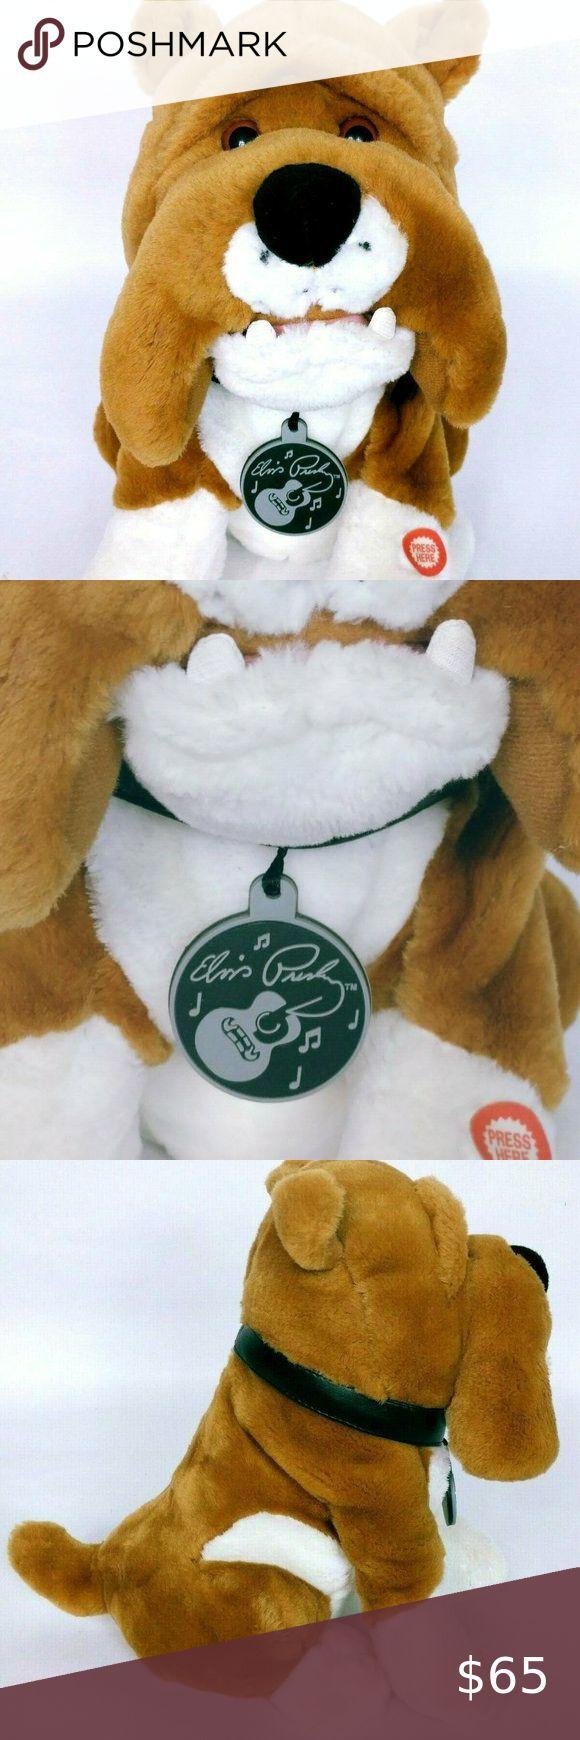 Elvis Presley Graceland Teddy Bear Plush Stuffed Animal ... |Elvis Presley Stuff Animal